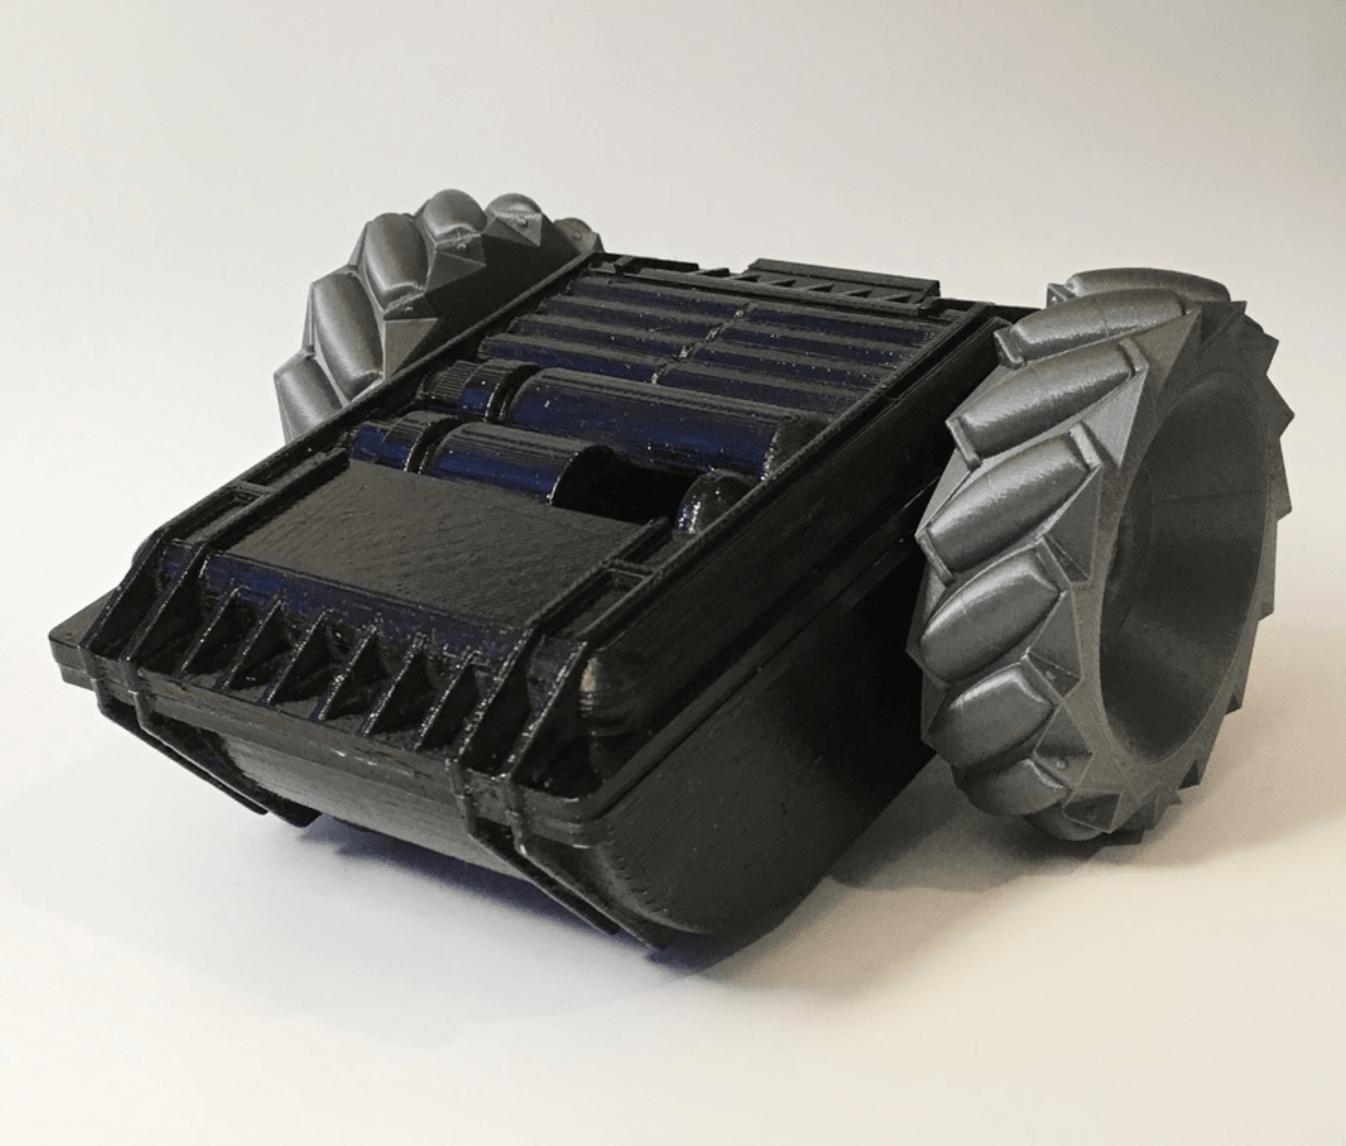 Capture d'écran 2018-04-25 à 09.48.14.png Download free STL file Twitch Drone Chassis for ZeroBot • 3D printable template, MaxMKA